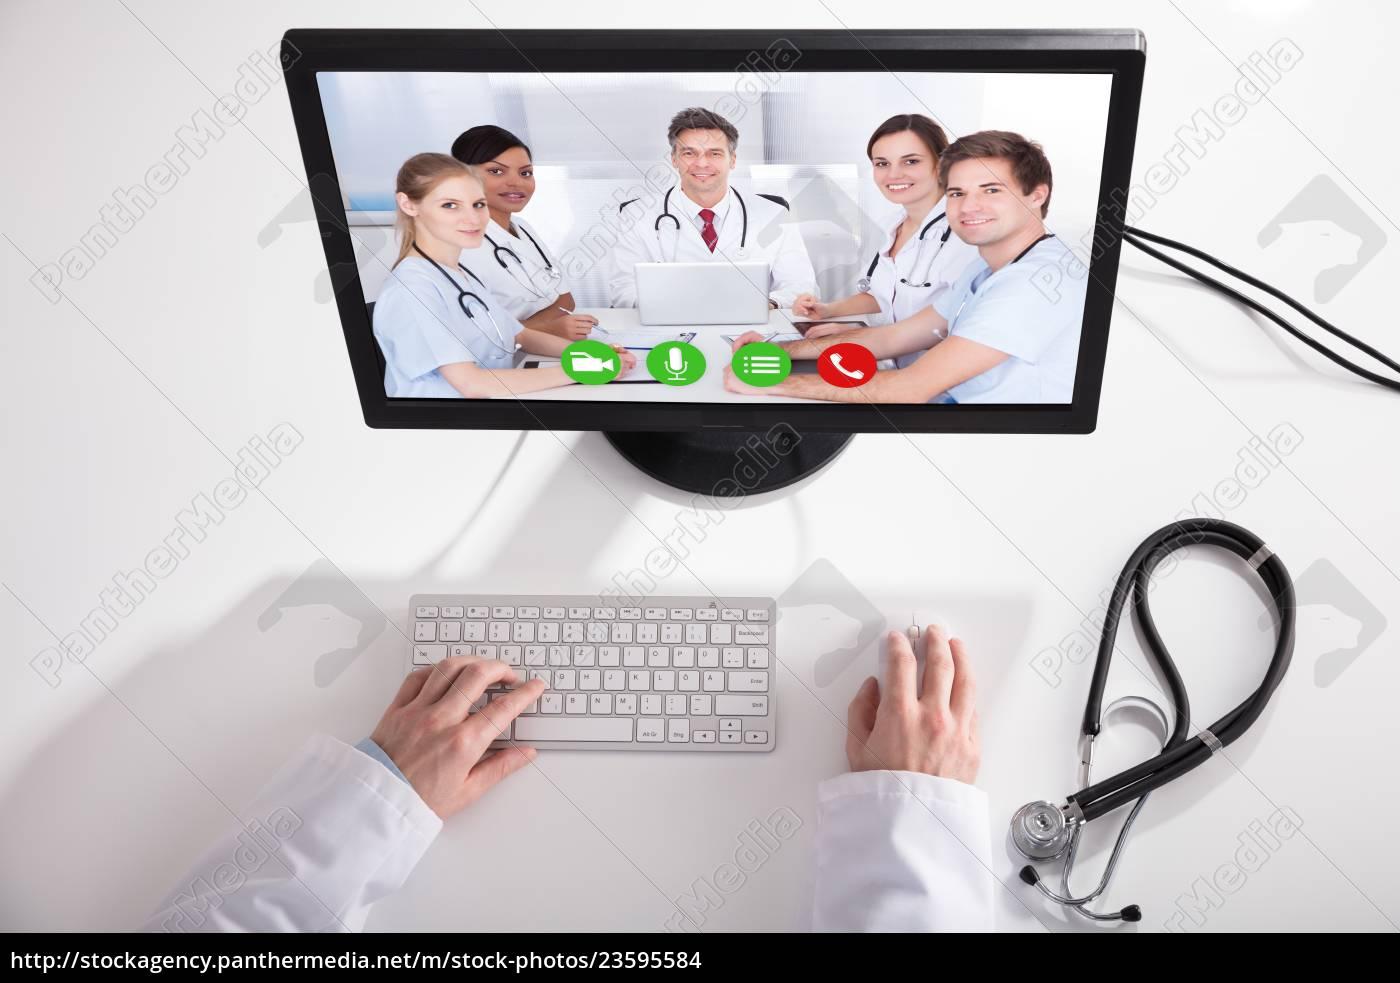 doktor, video, conferencing, mit, medizinischem, team - 23595584